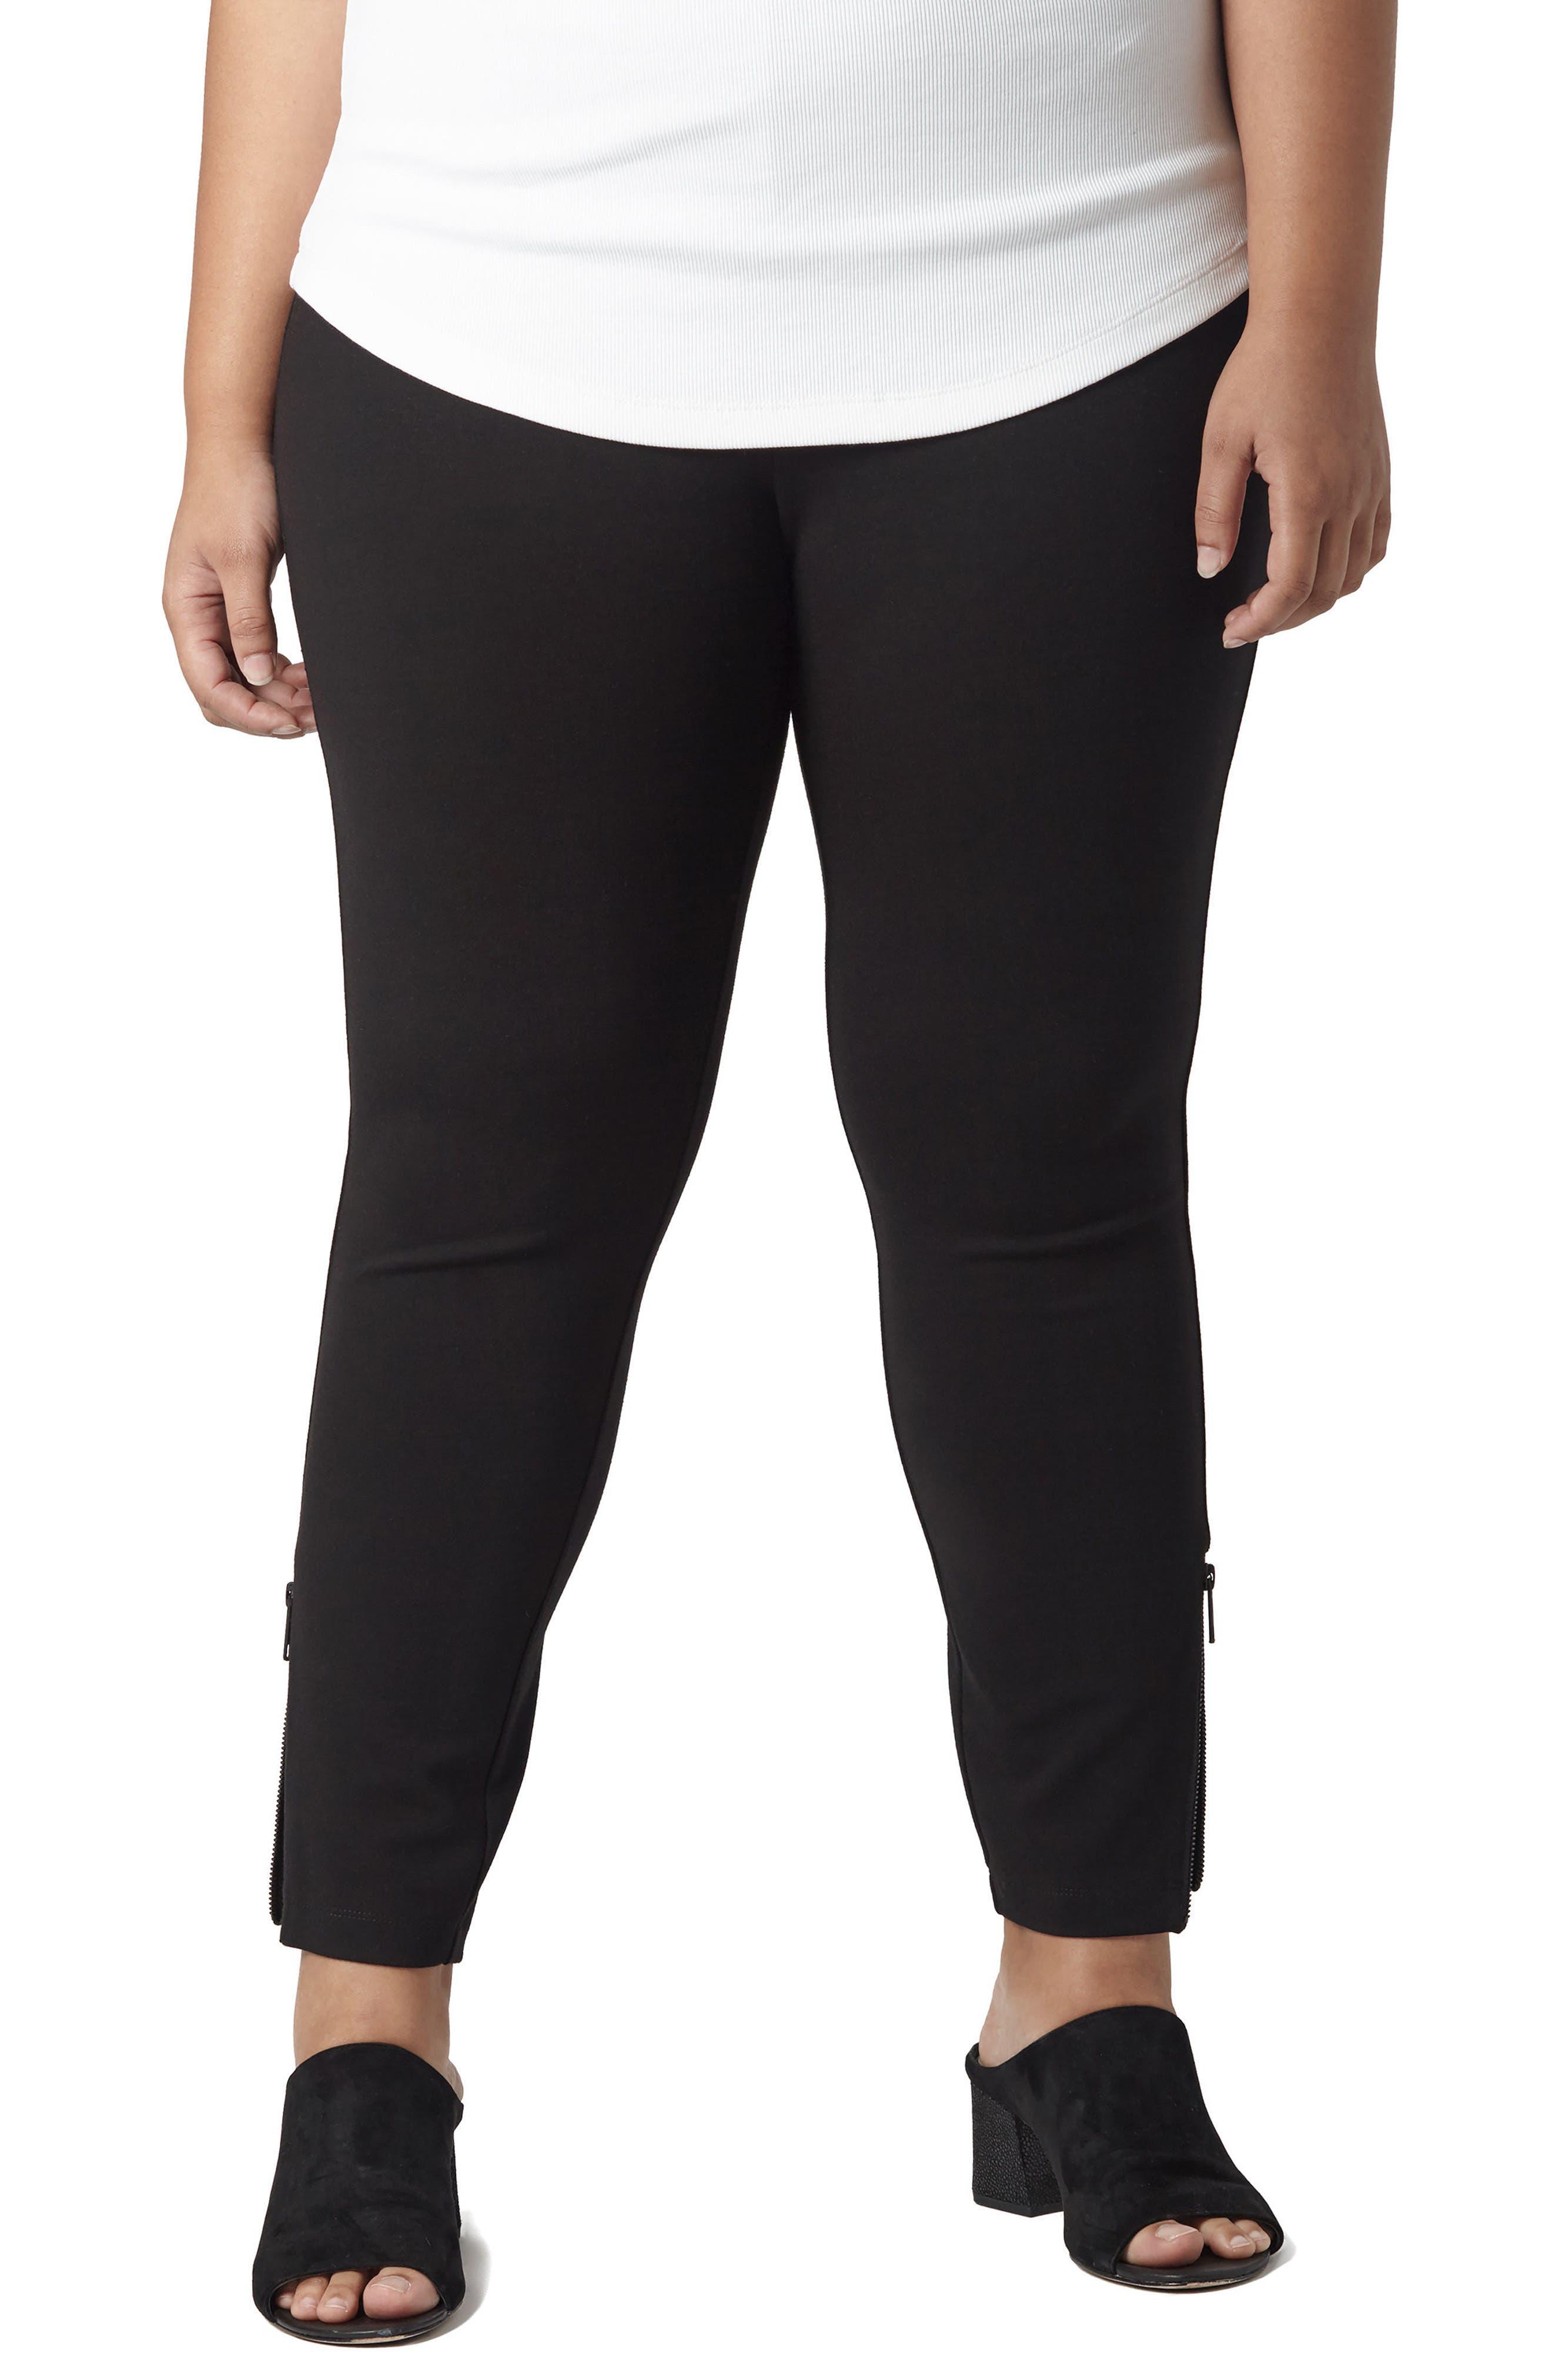 277bfef32c9 Buy universal standard pants for women - Best women s universal ...